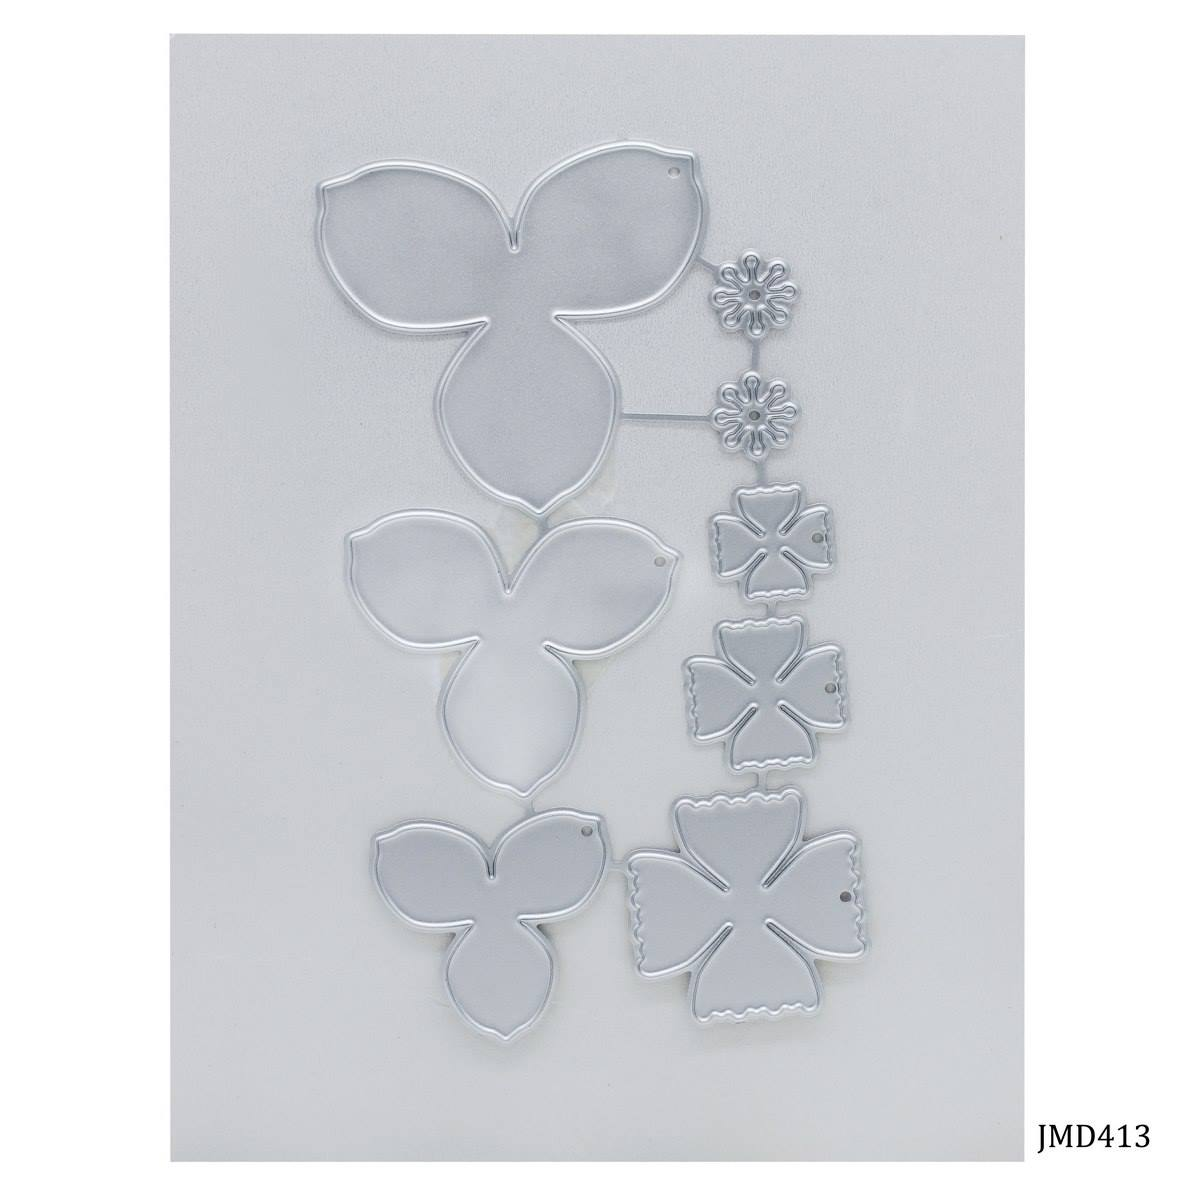 Metal Cutting Dies 8In1 Flower Design